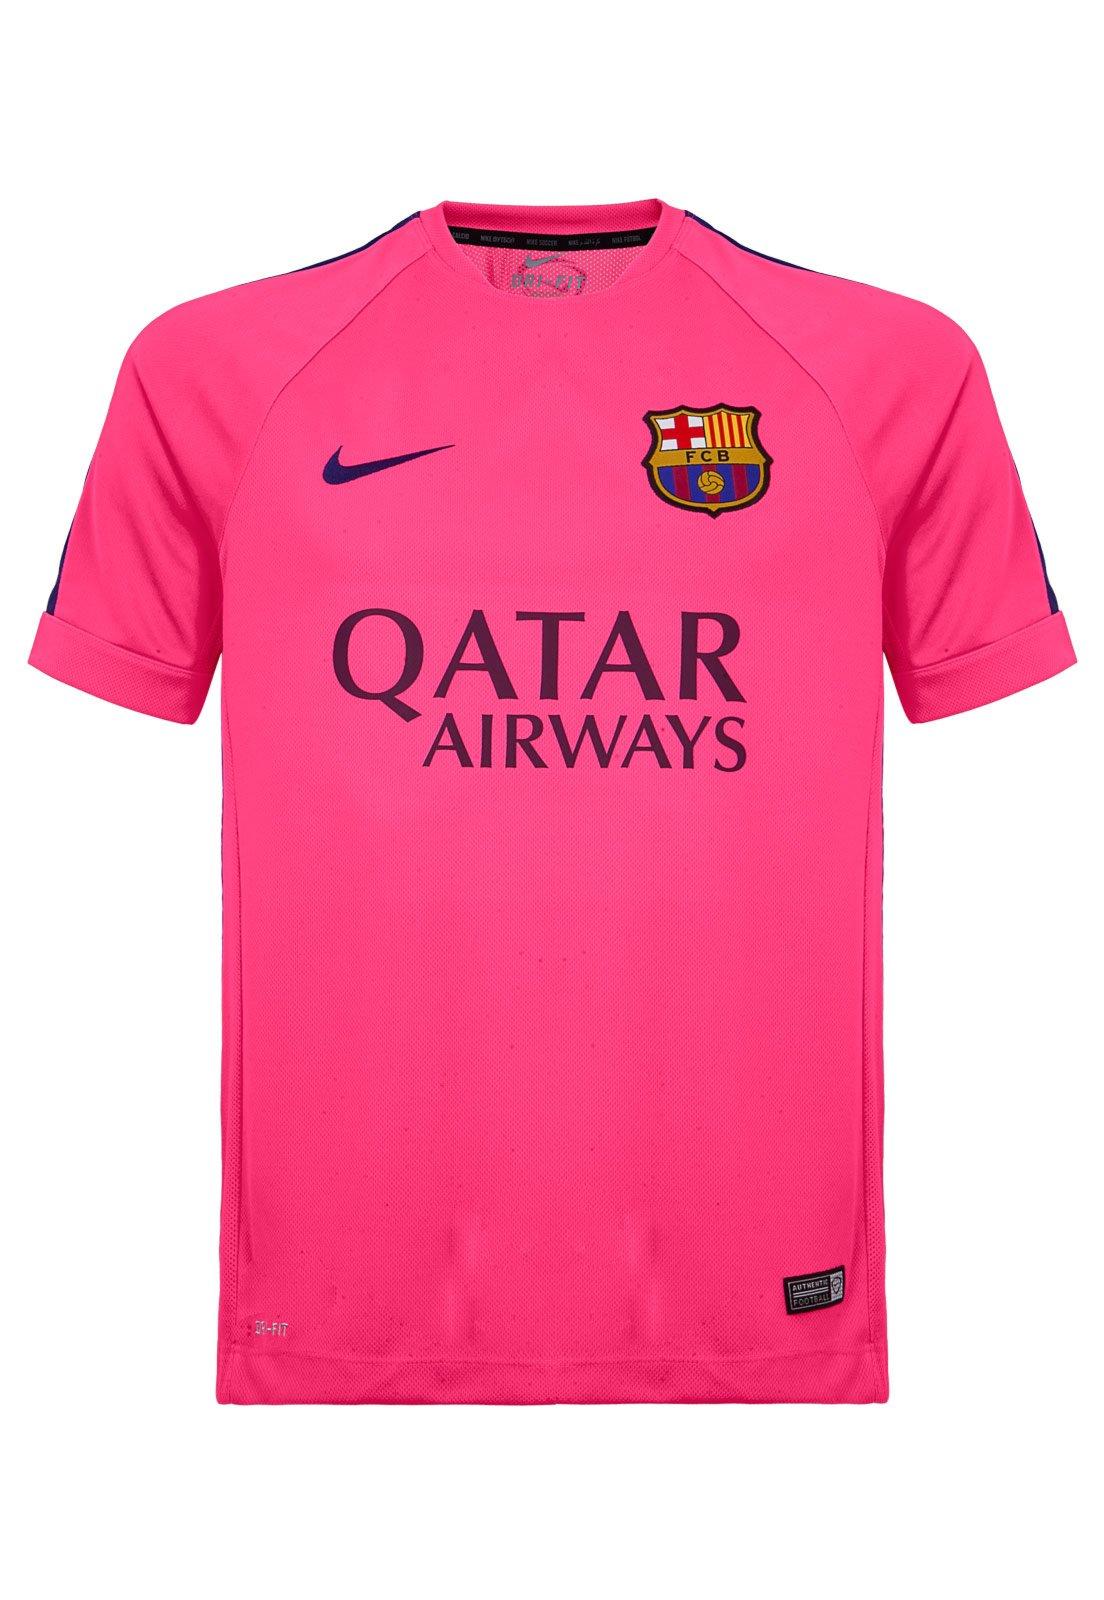 Camiseta Nike Barcelona Squad Sdln Wvn Wup Rosa Compre Agora Dafiti Brasil